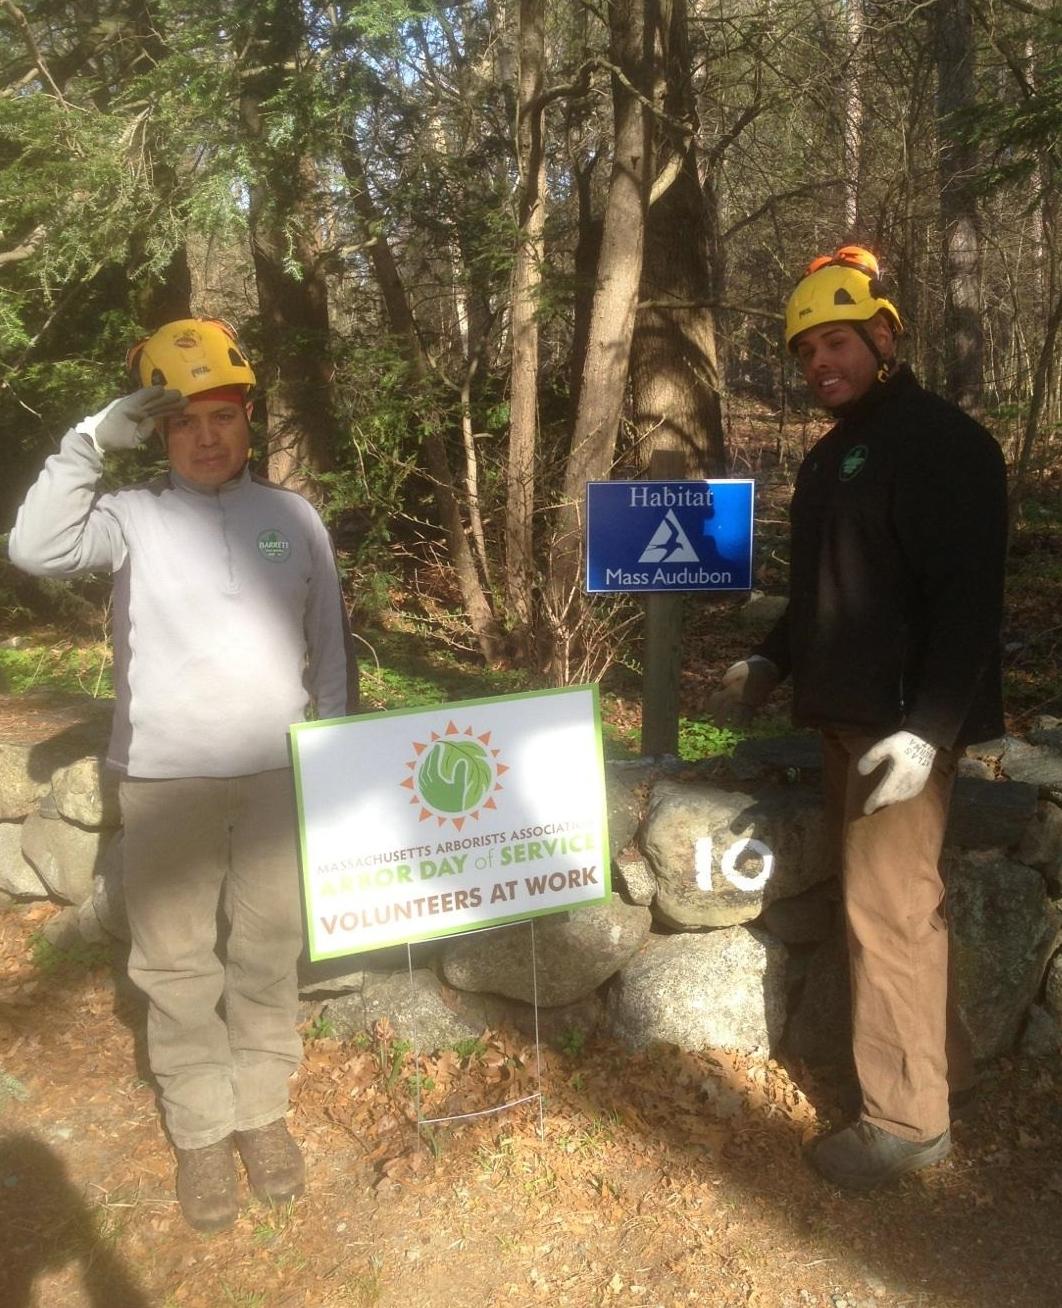 BTSE's Vincente & Roger volunteered their talents at Mass Audubon's Habitat Wildlife Sanctuary in Belmont.